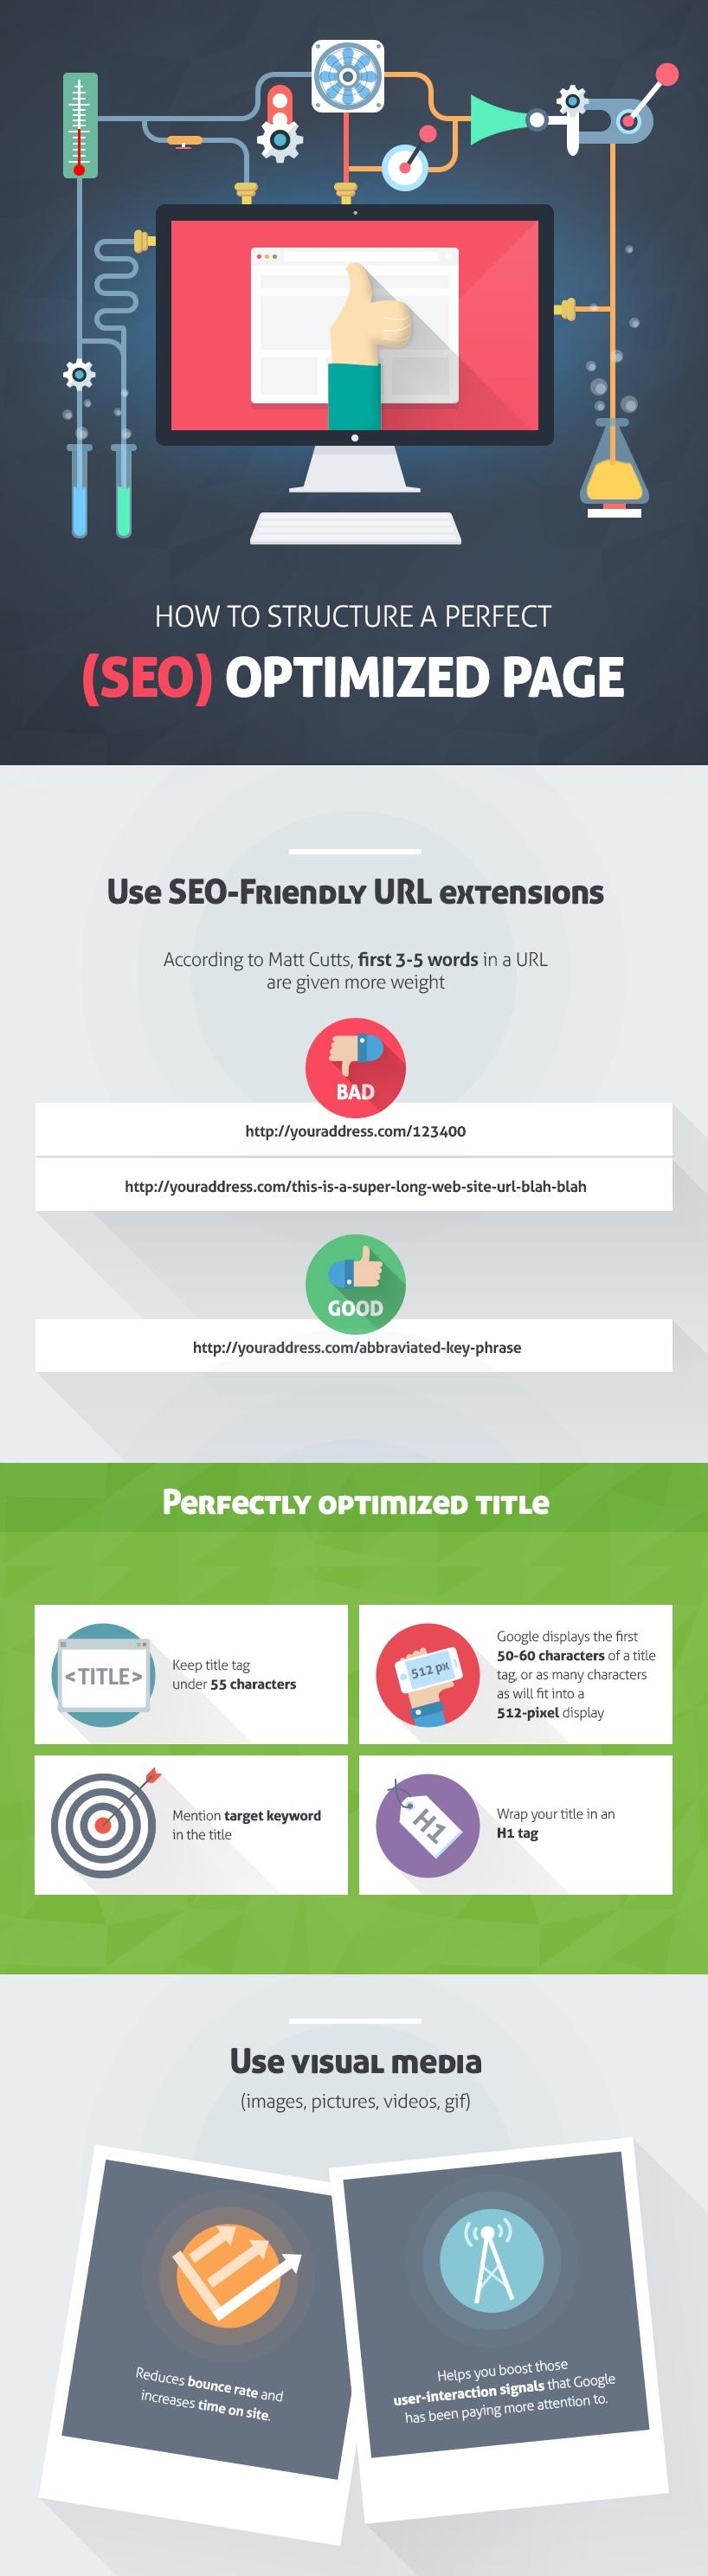 visual-content-marketing-1-ig-kissmetrics